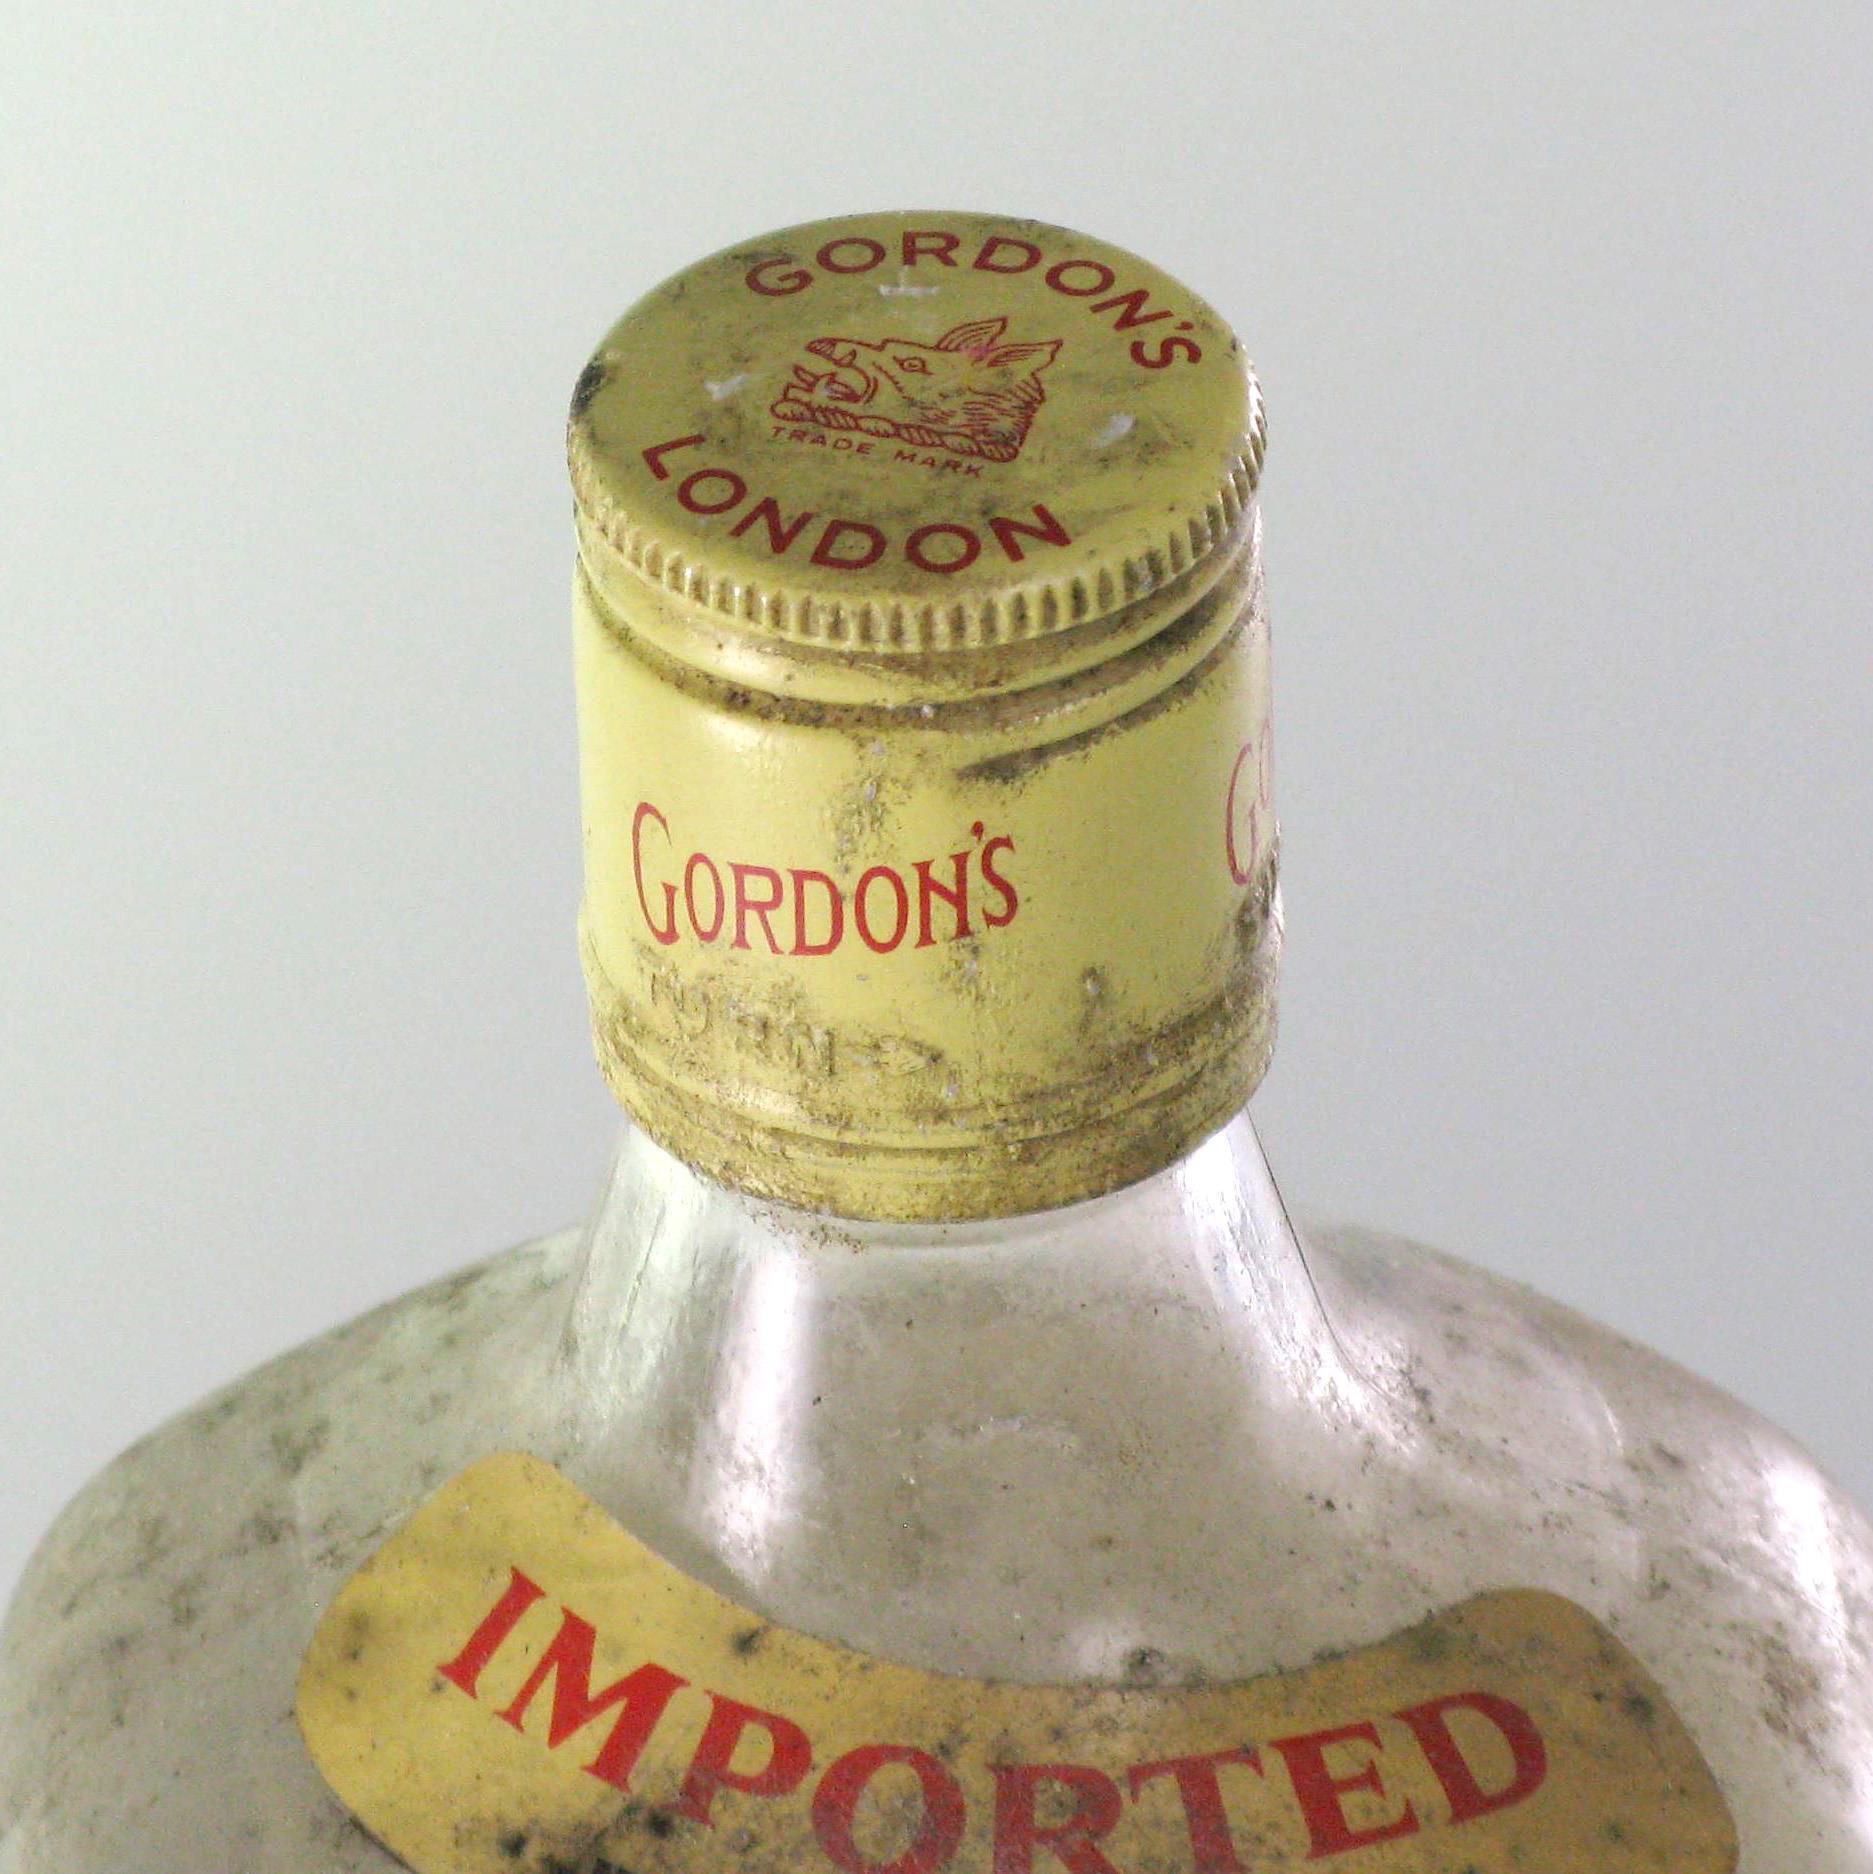 Gordon's London Dry Gin 70s